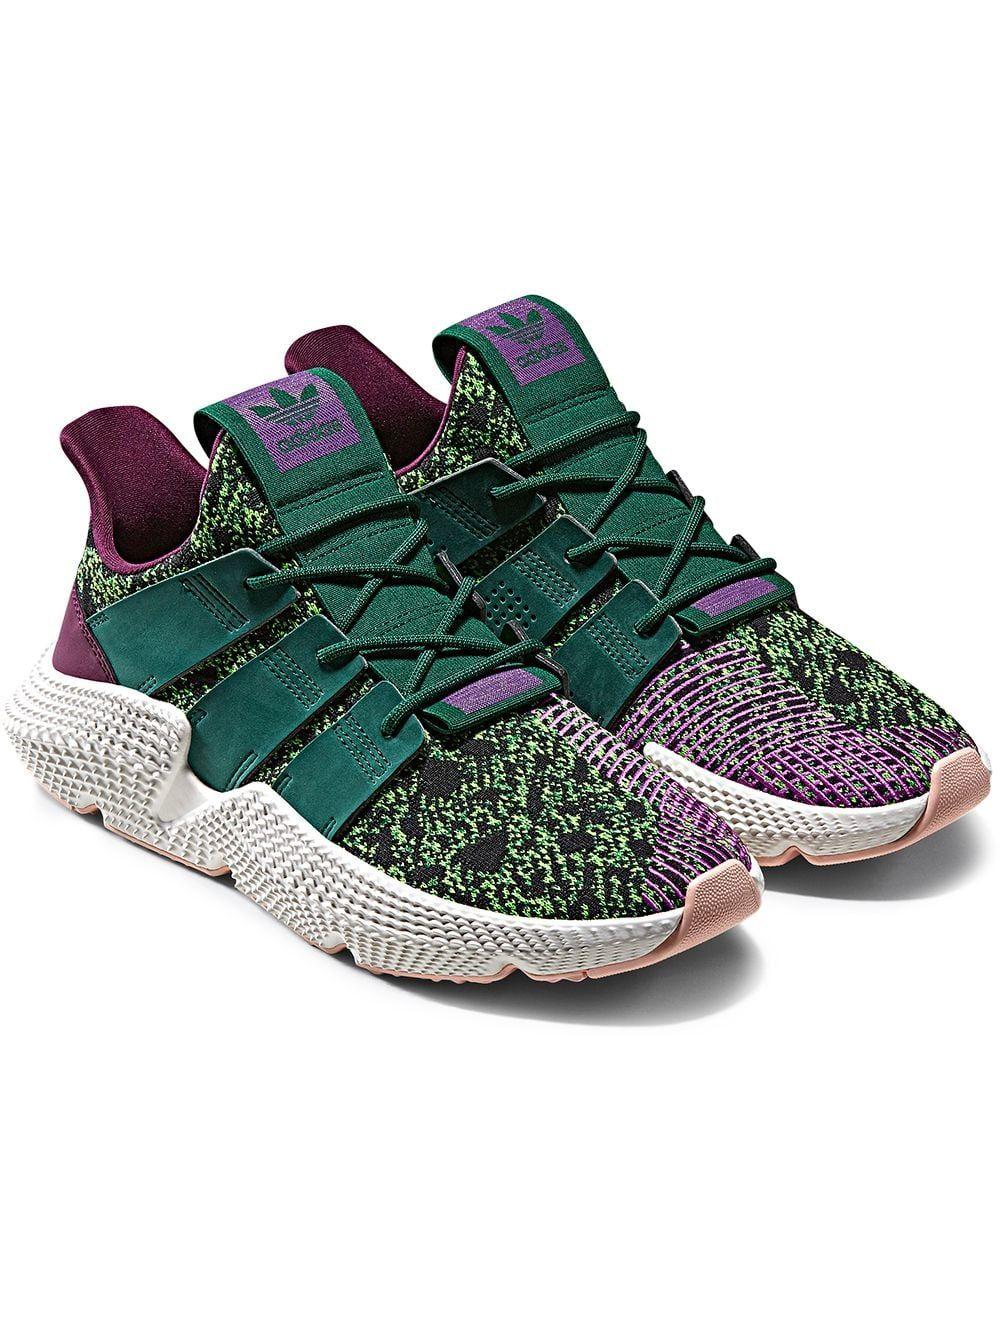 b49e2ea422815 ADIDAS ORIGINALS ADIDAS GREEN AND PURPLE PROPHERE DRAGON BALL Z CELL  EDITION SNEAKERS.  adidasoriginals  shoes